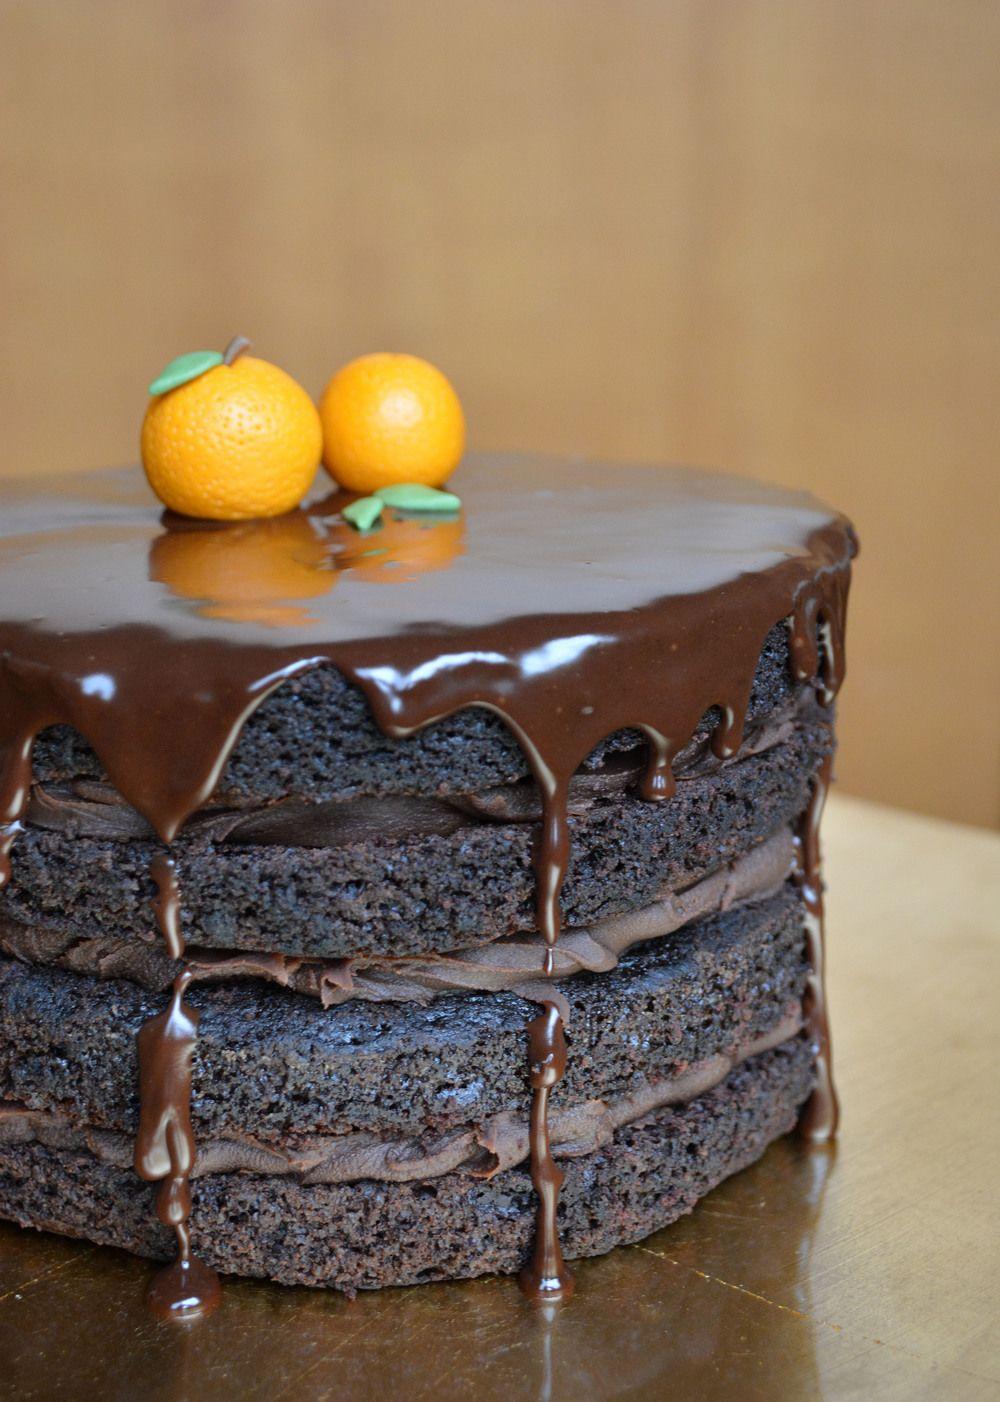 Recipe: Orange Chocolate Cake with Cointreau Ganache